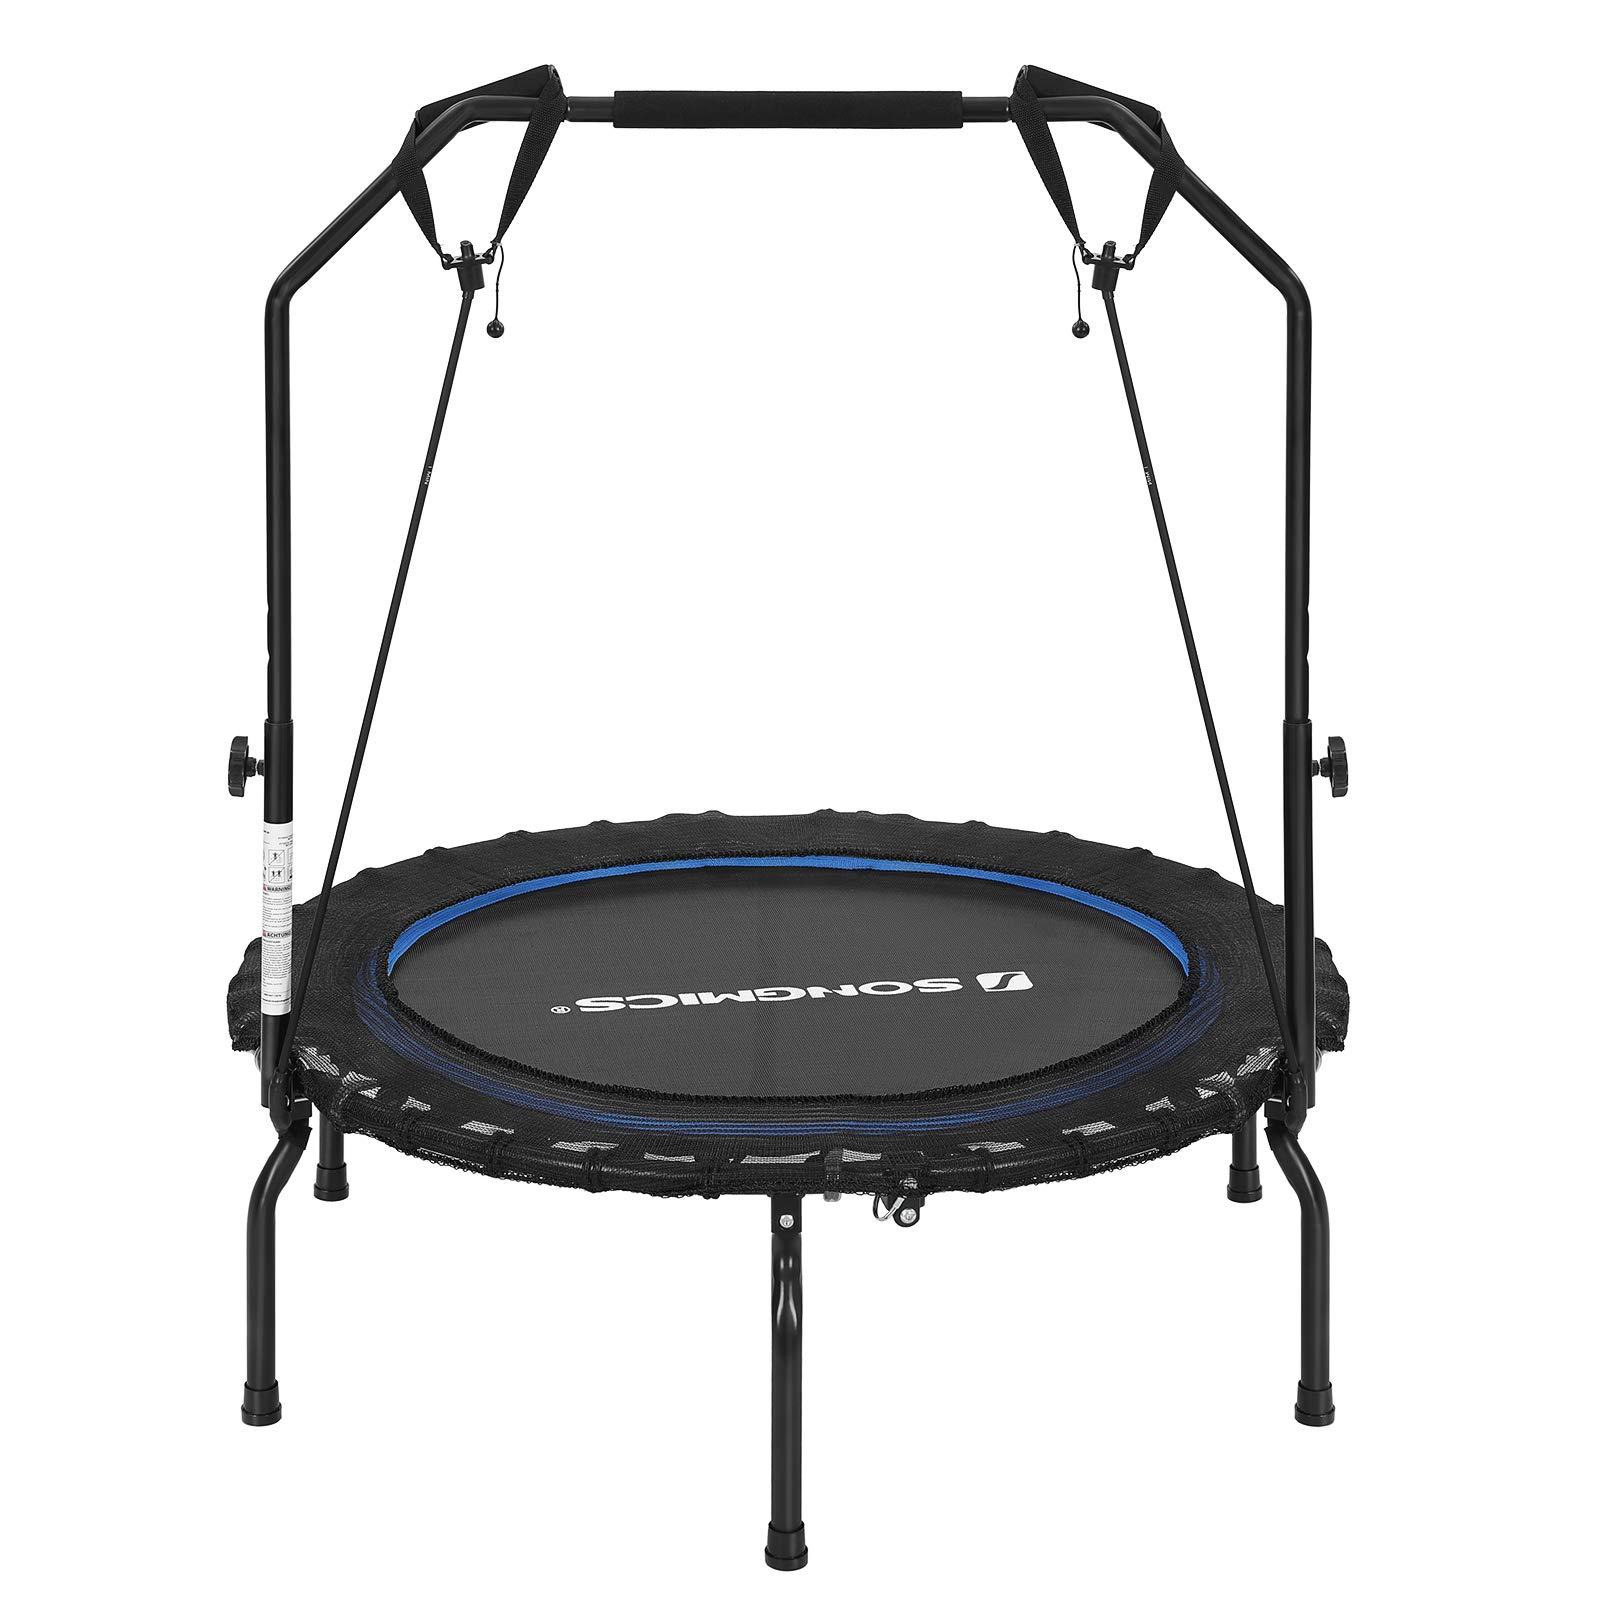 SONGMICS Fitness Trampoline 40 Inches USTR40BUV1